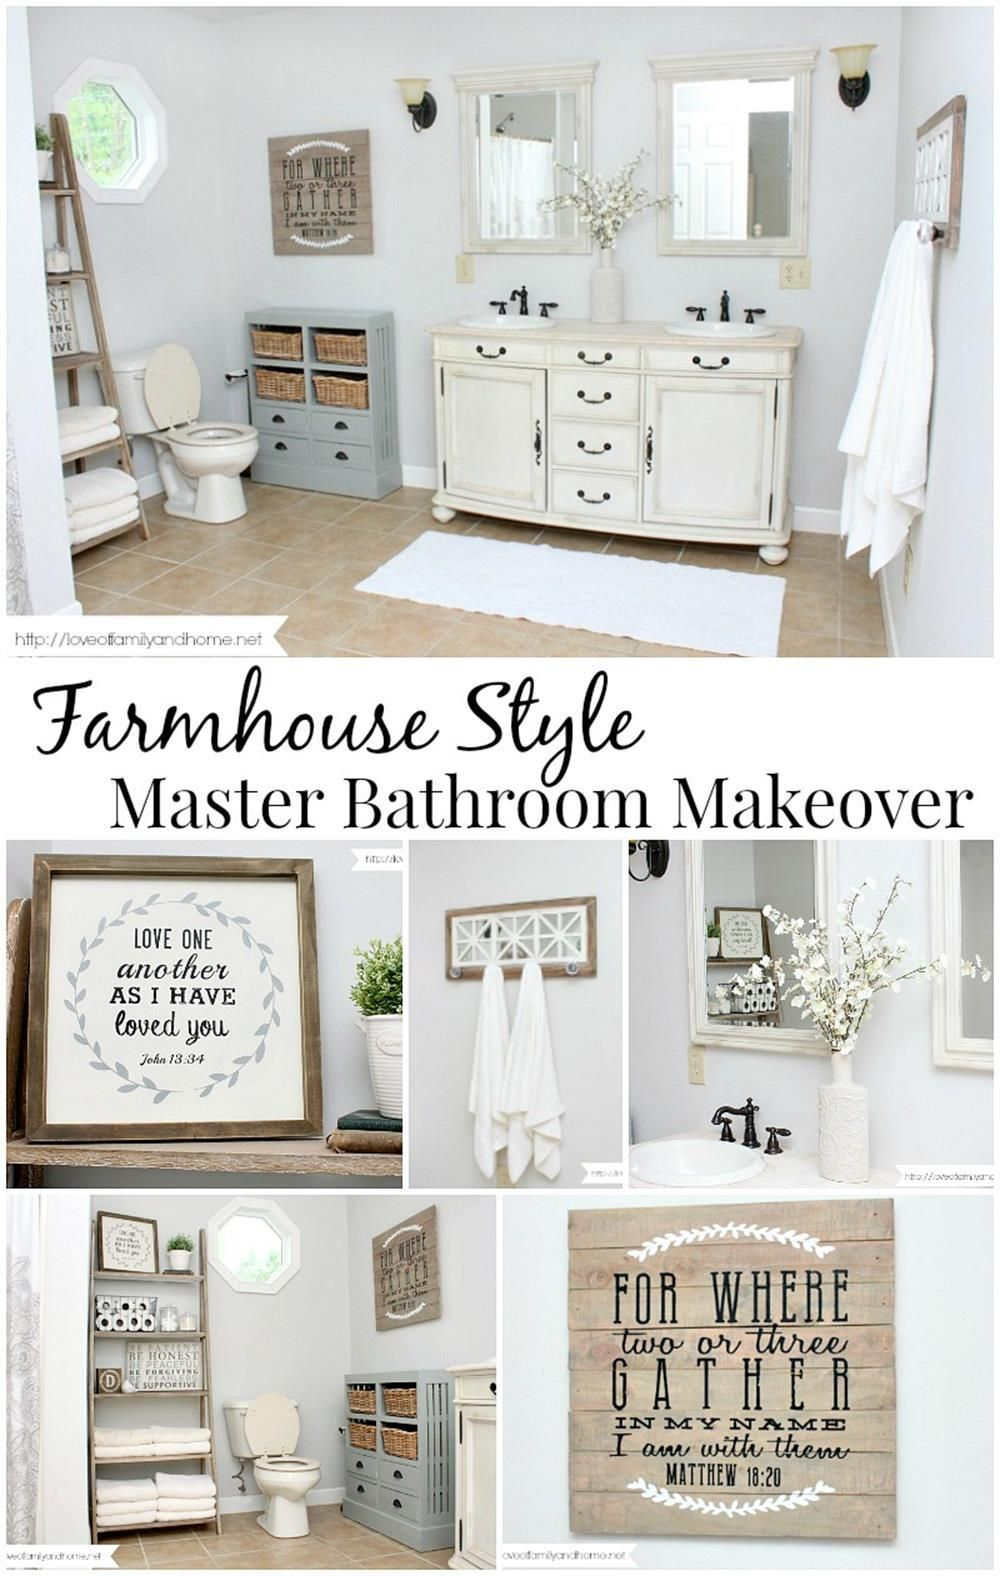 26 Charming Farmhouse Bathroom Accessories Ideas | Bathroom Ideas ...